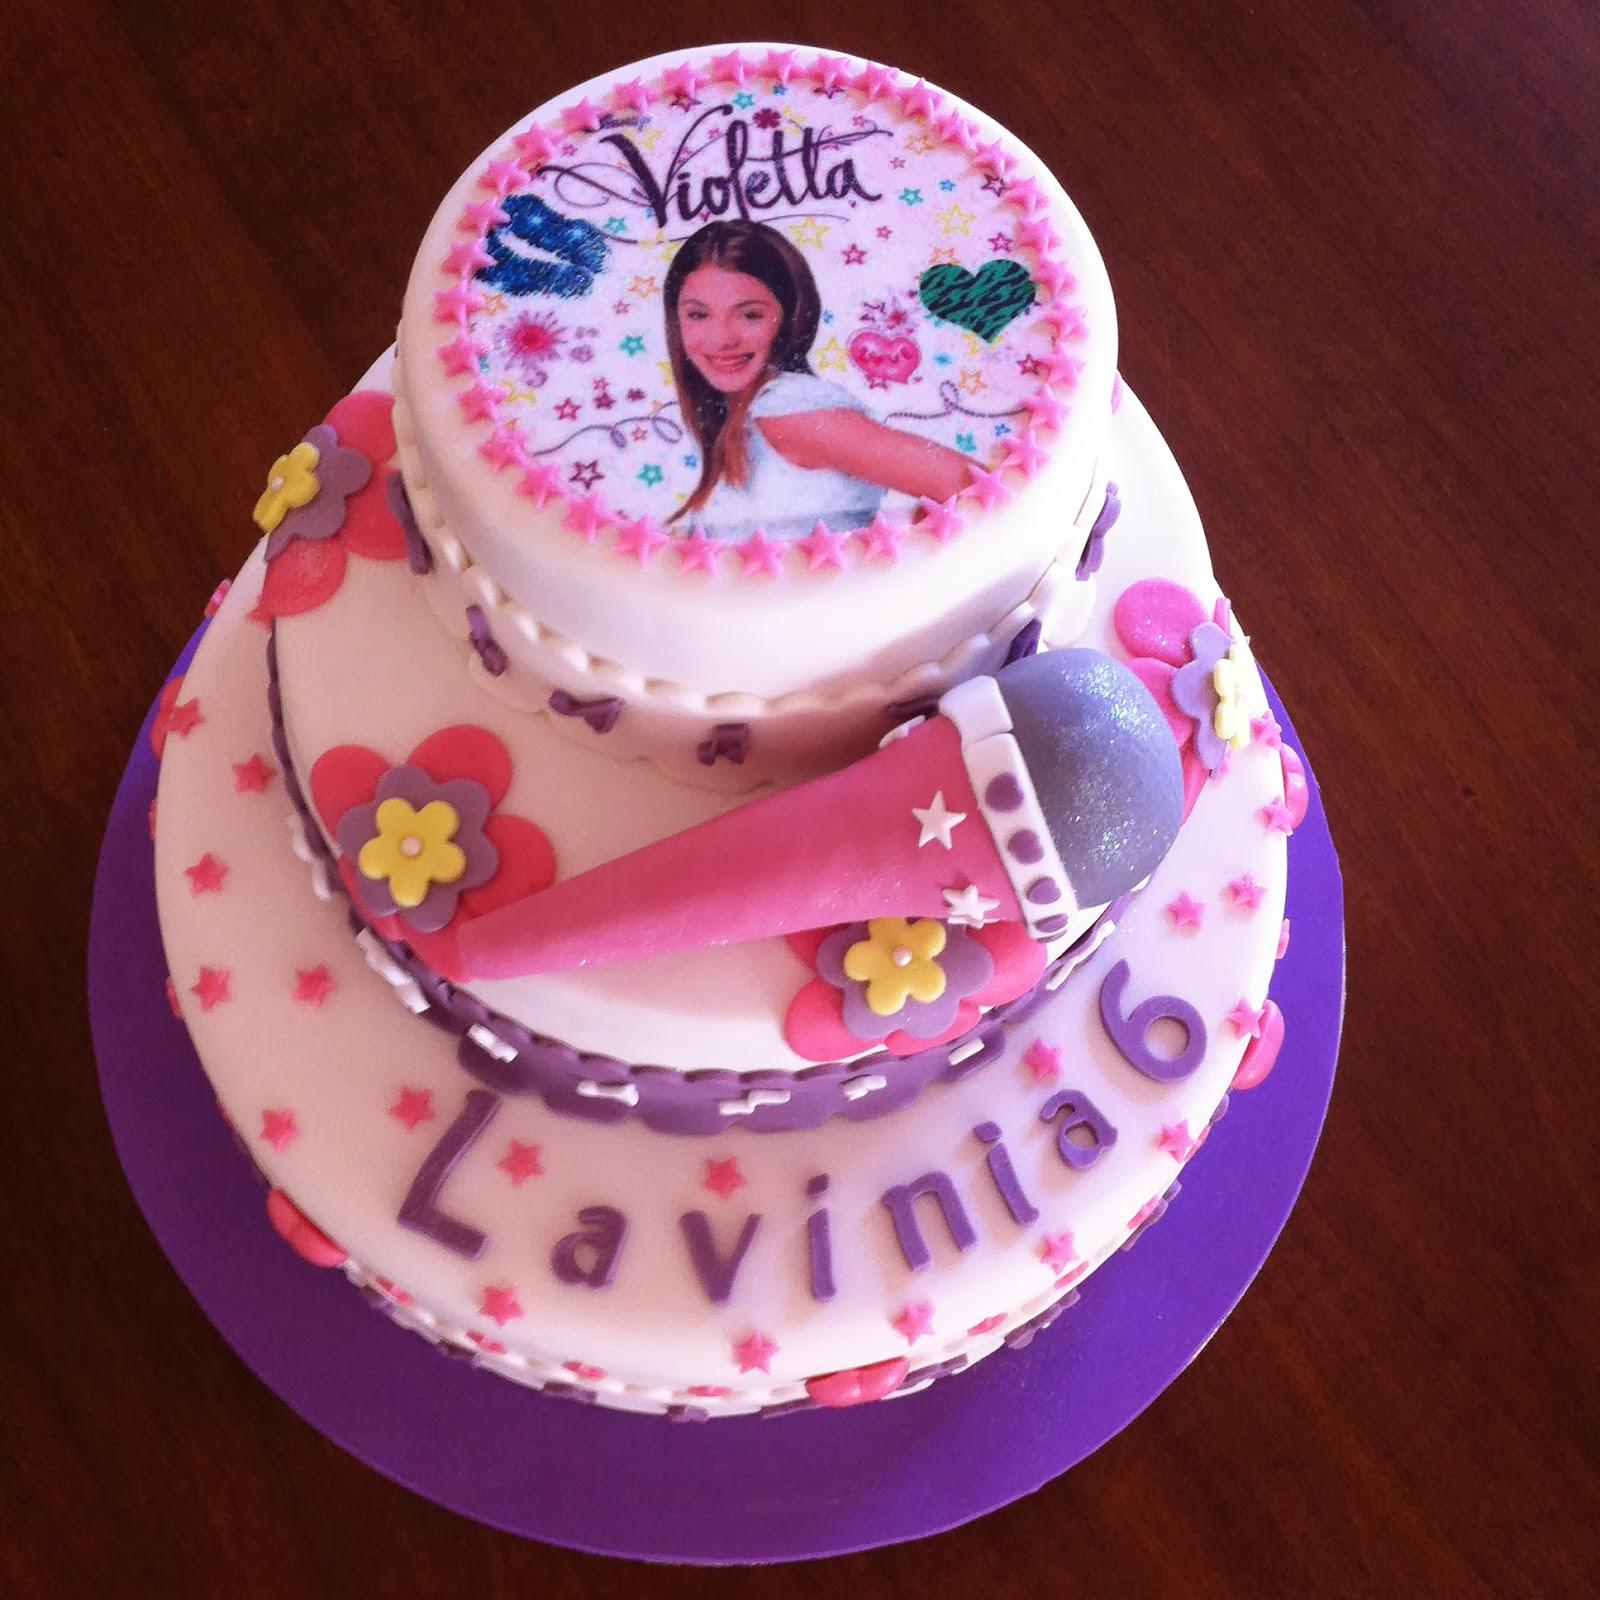 Violetta Cake Cake Ideas and Designs